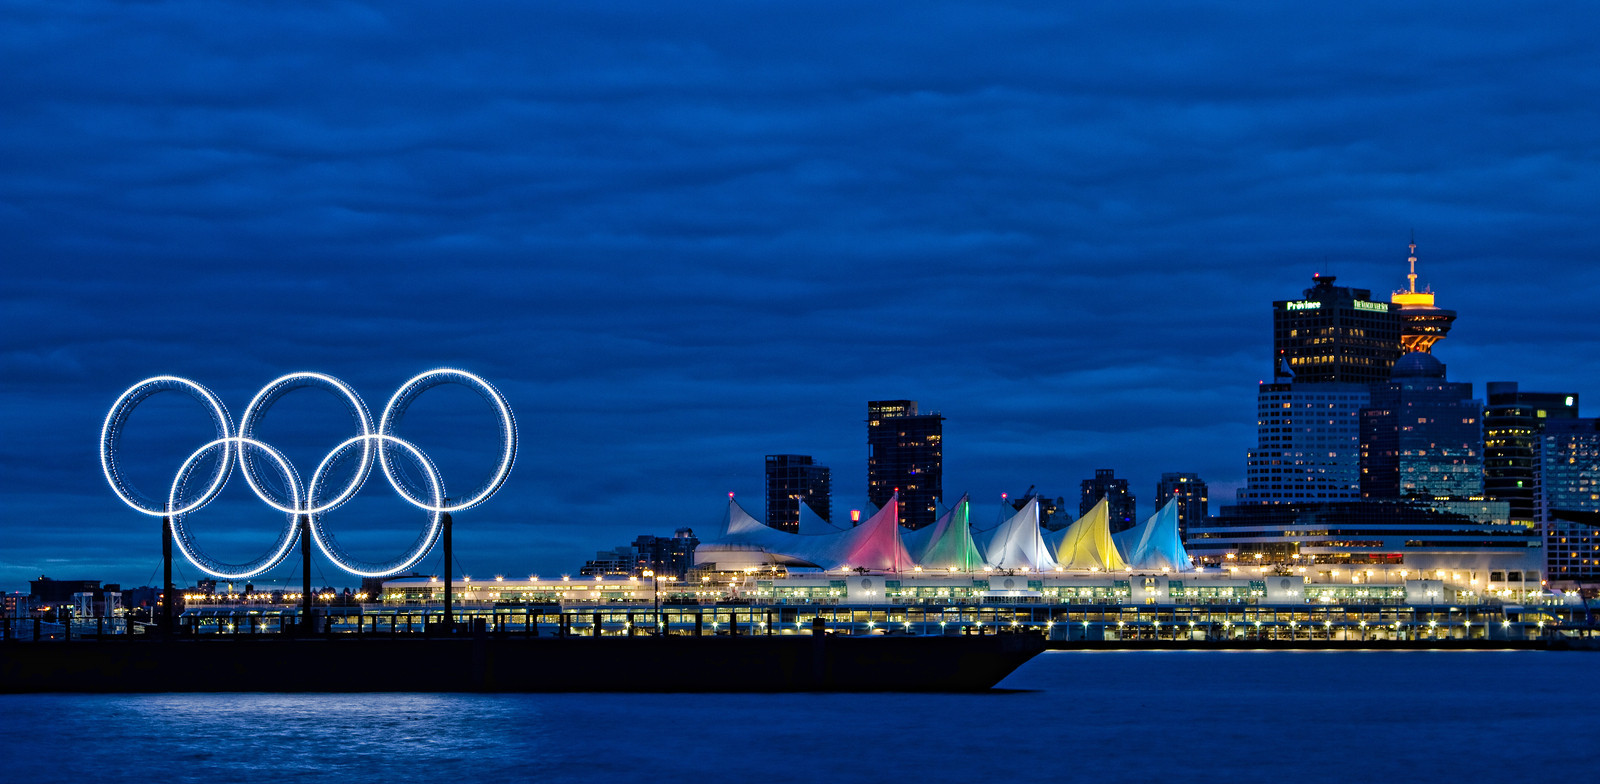 vancouver_olympic_rings-1_topaz-X3.jpg